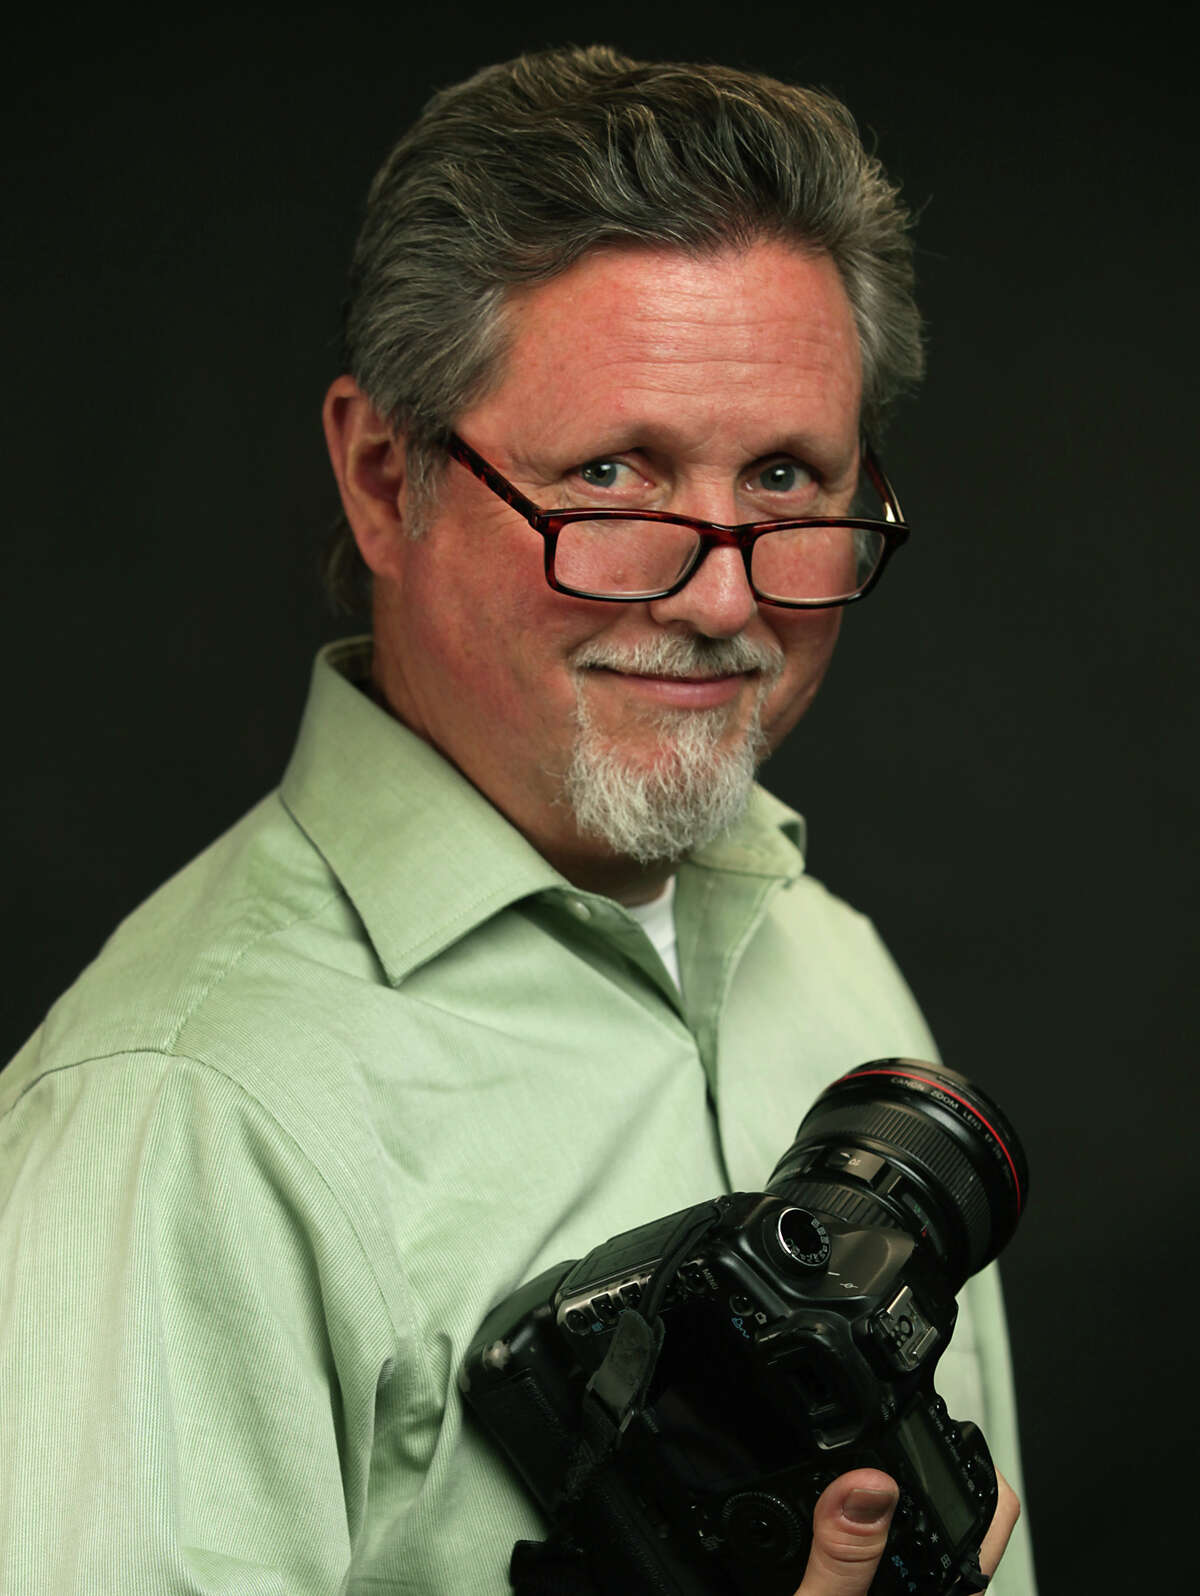 Staff photographer Bob Owen